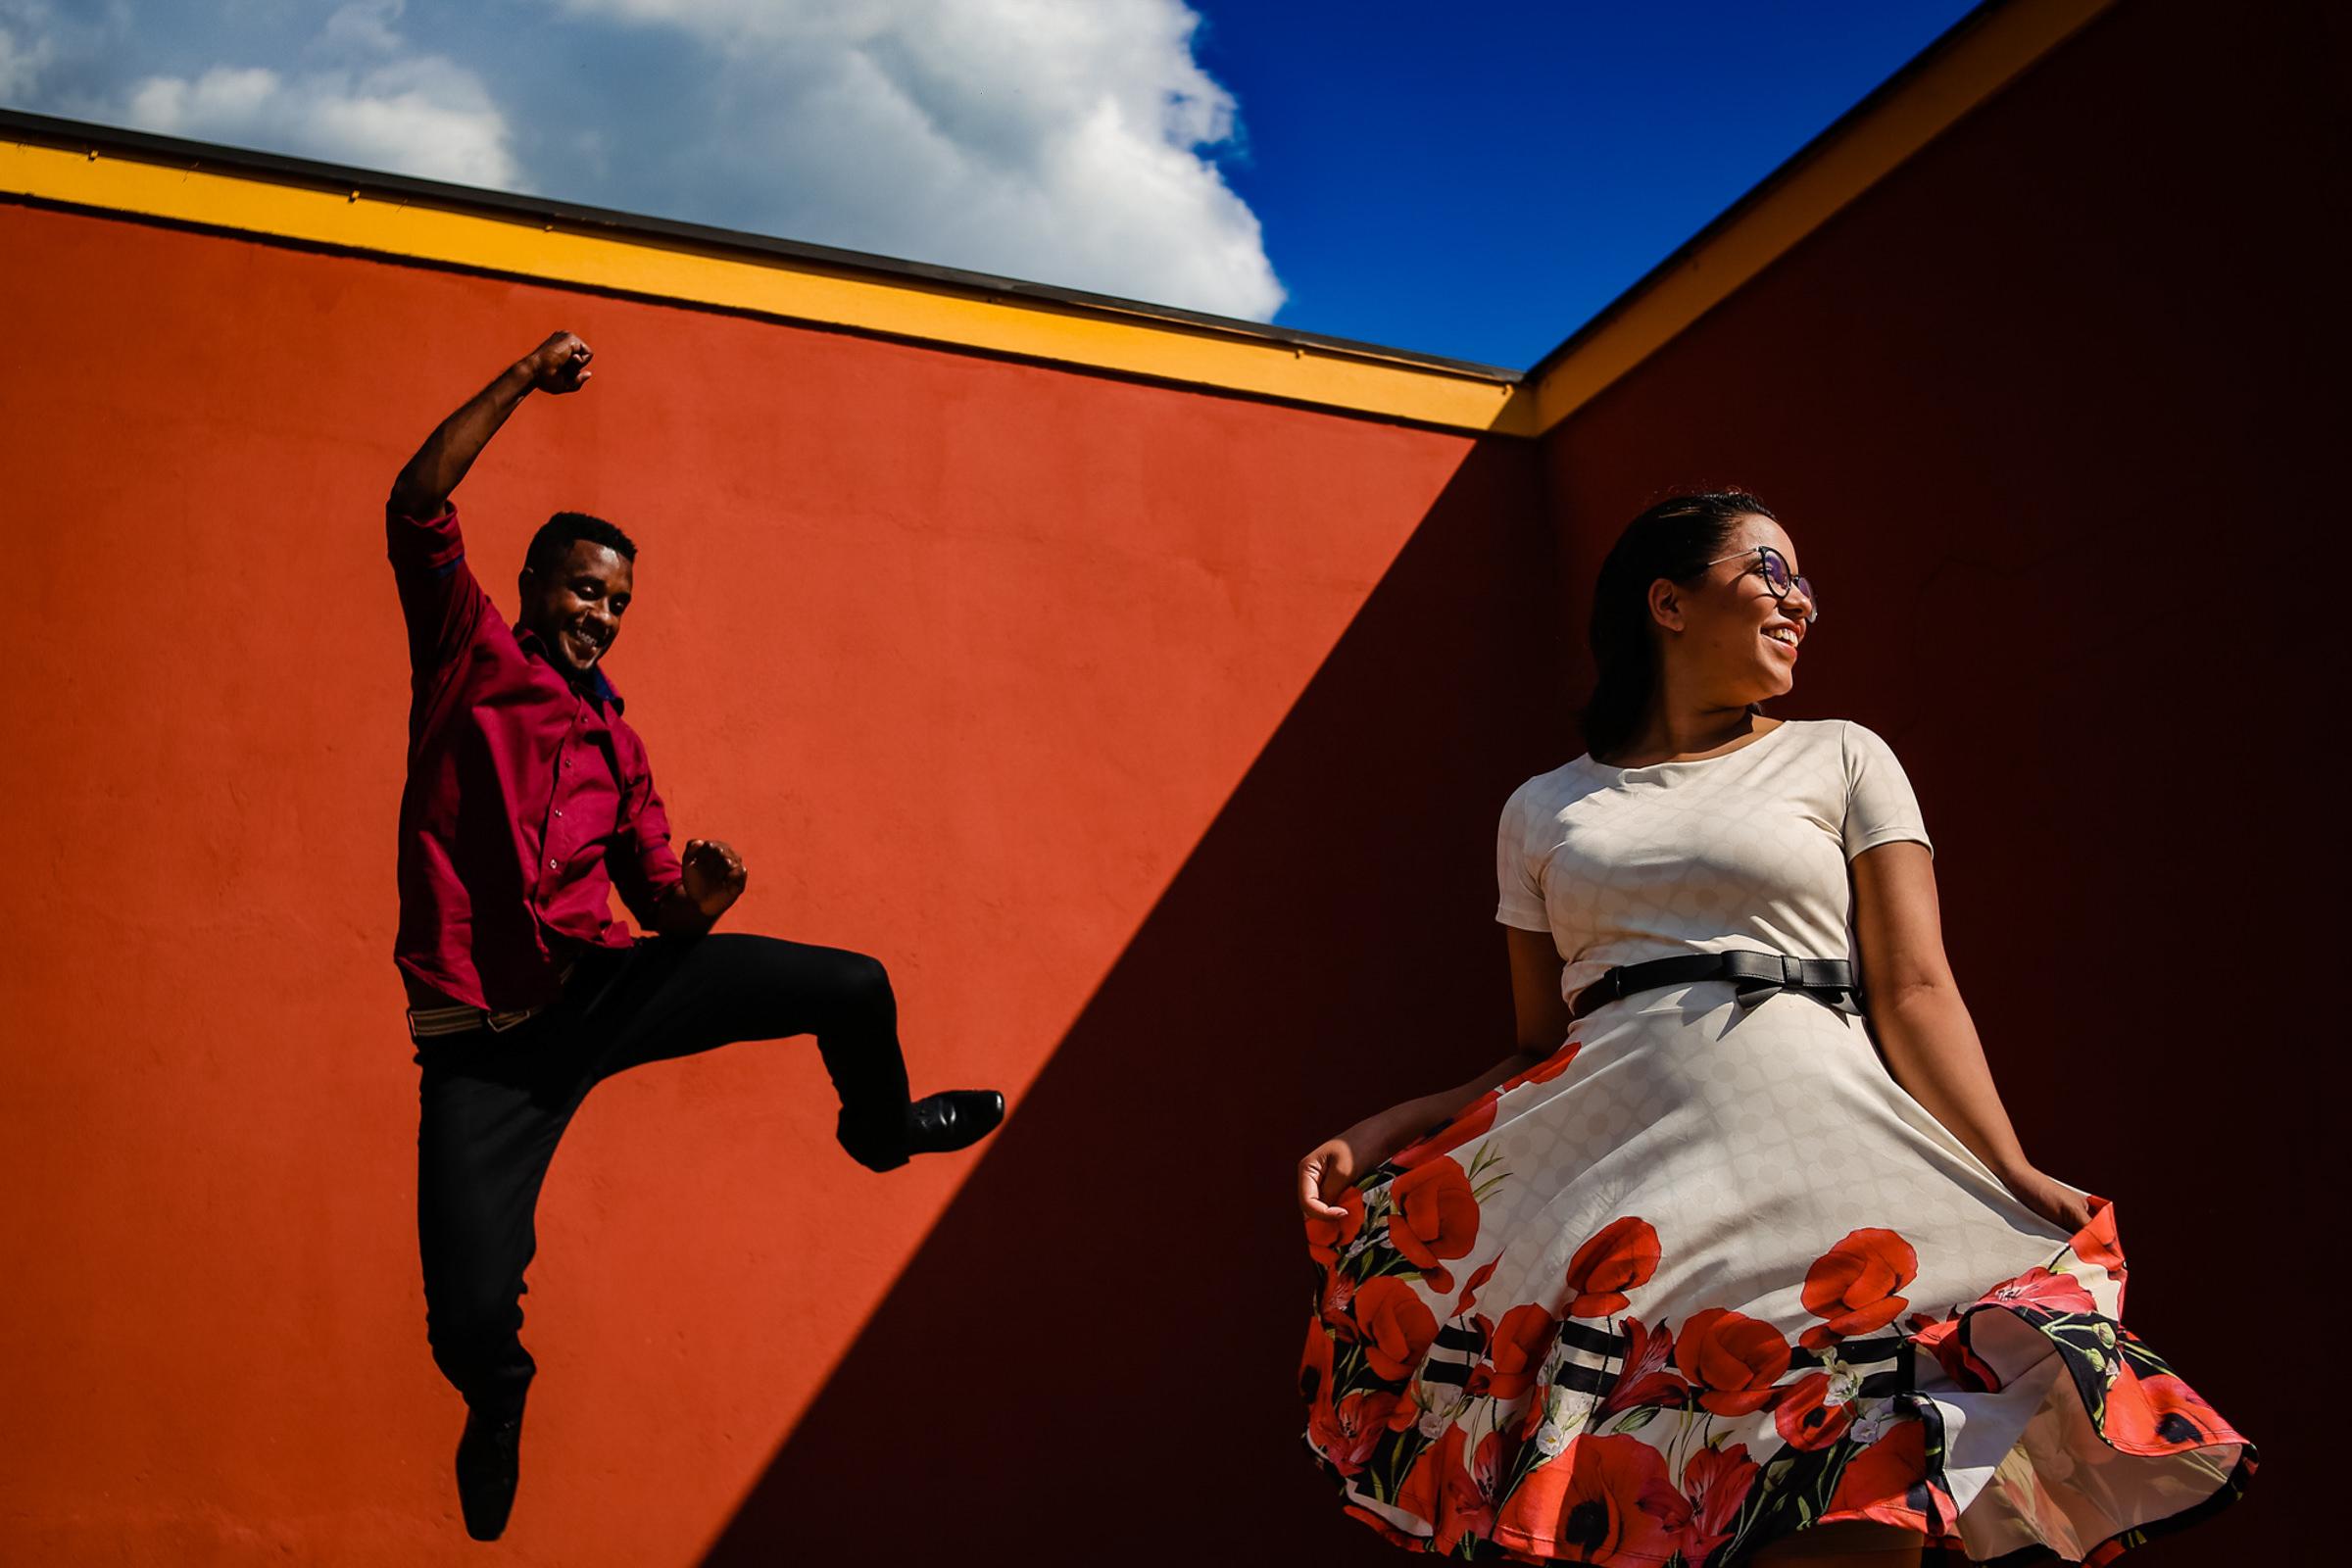 Groom jumps with joy while bride swirls her dress - Award-winning photo by Area da Fotografia - Brazil